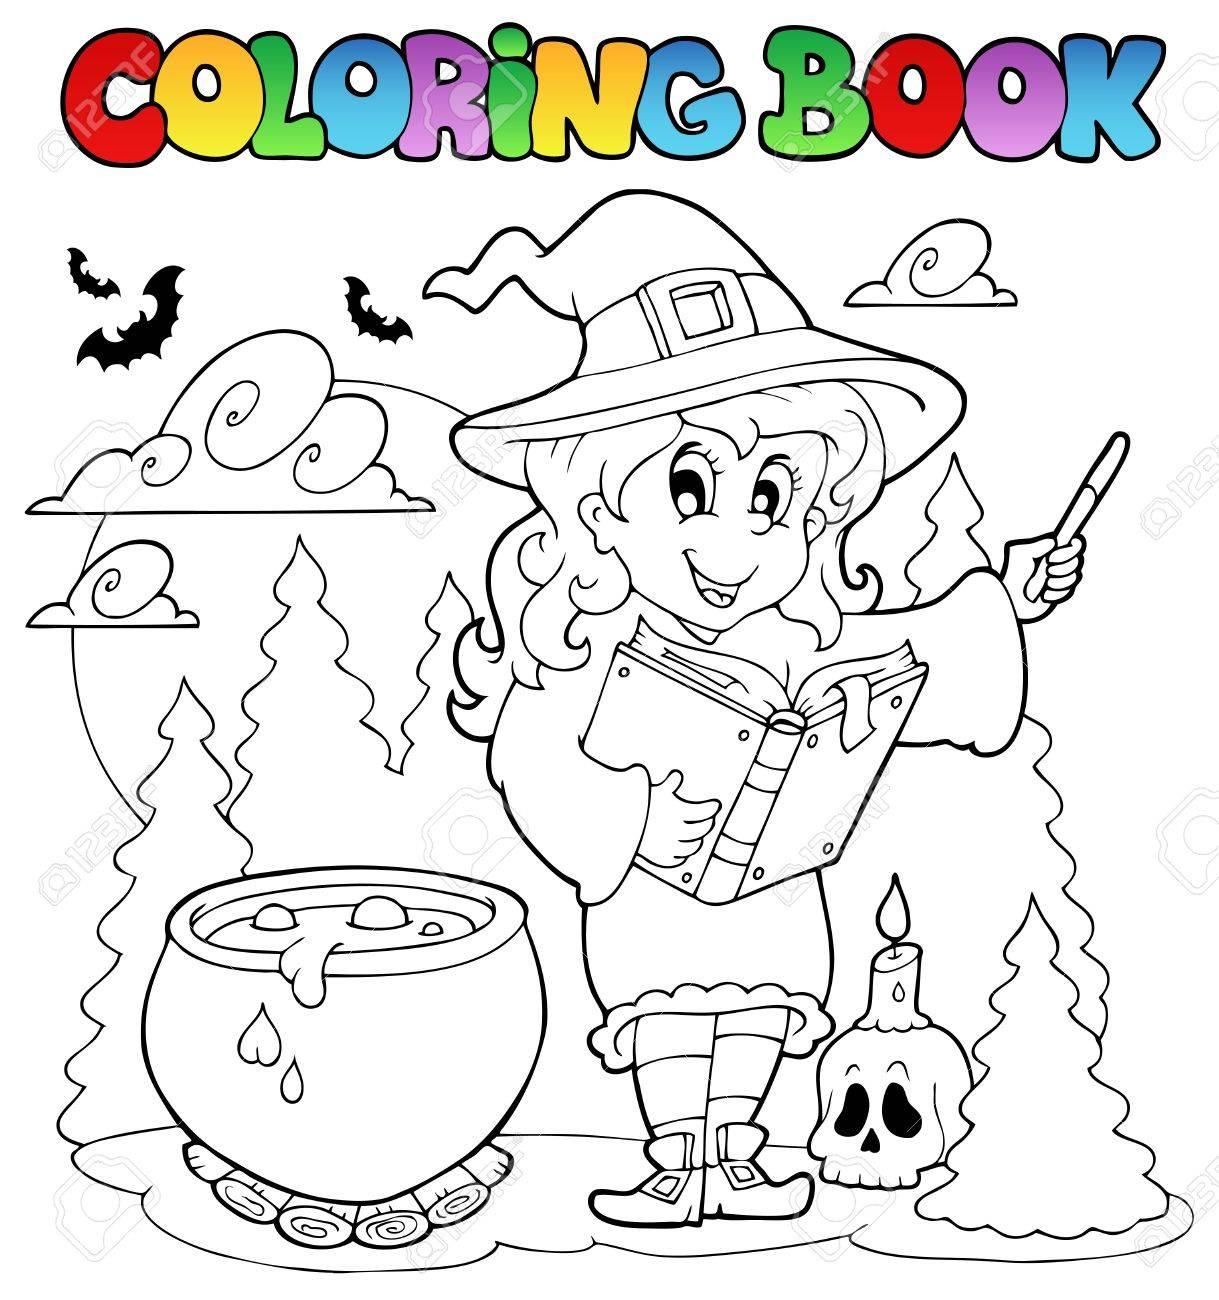 coloring clothes stock photos royalty free coloring clothes